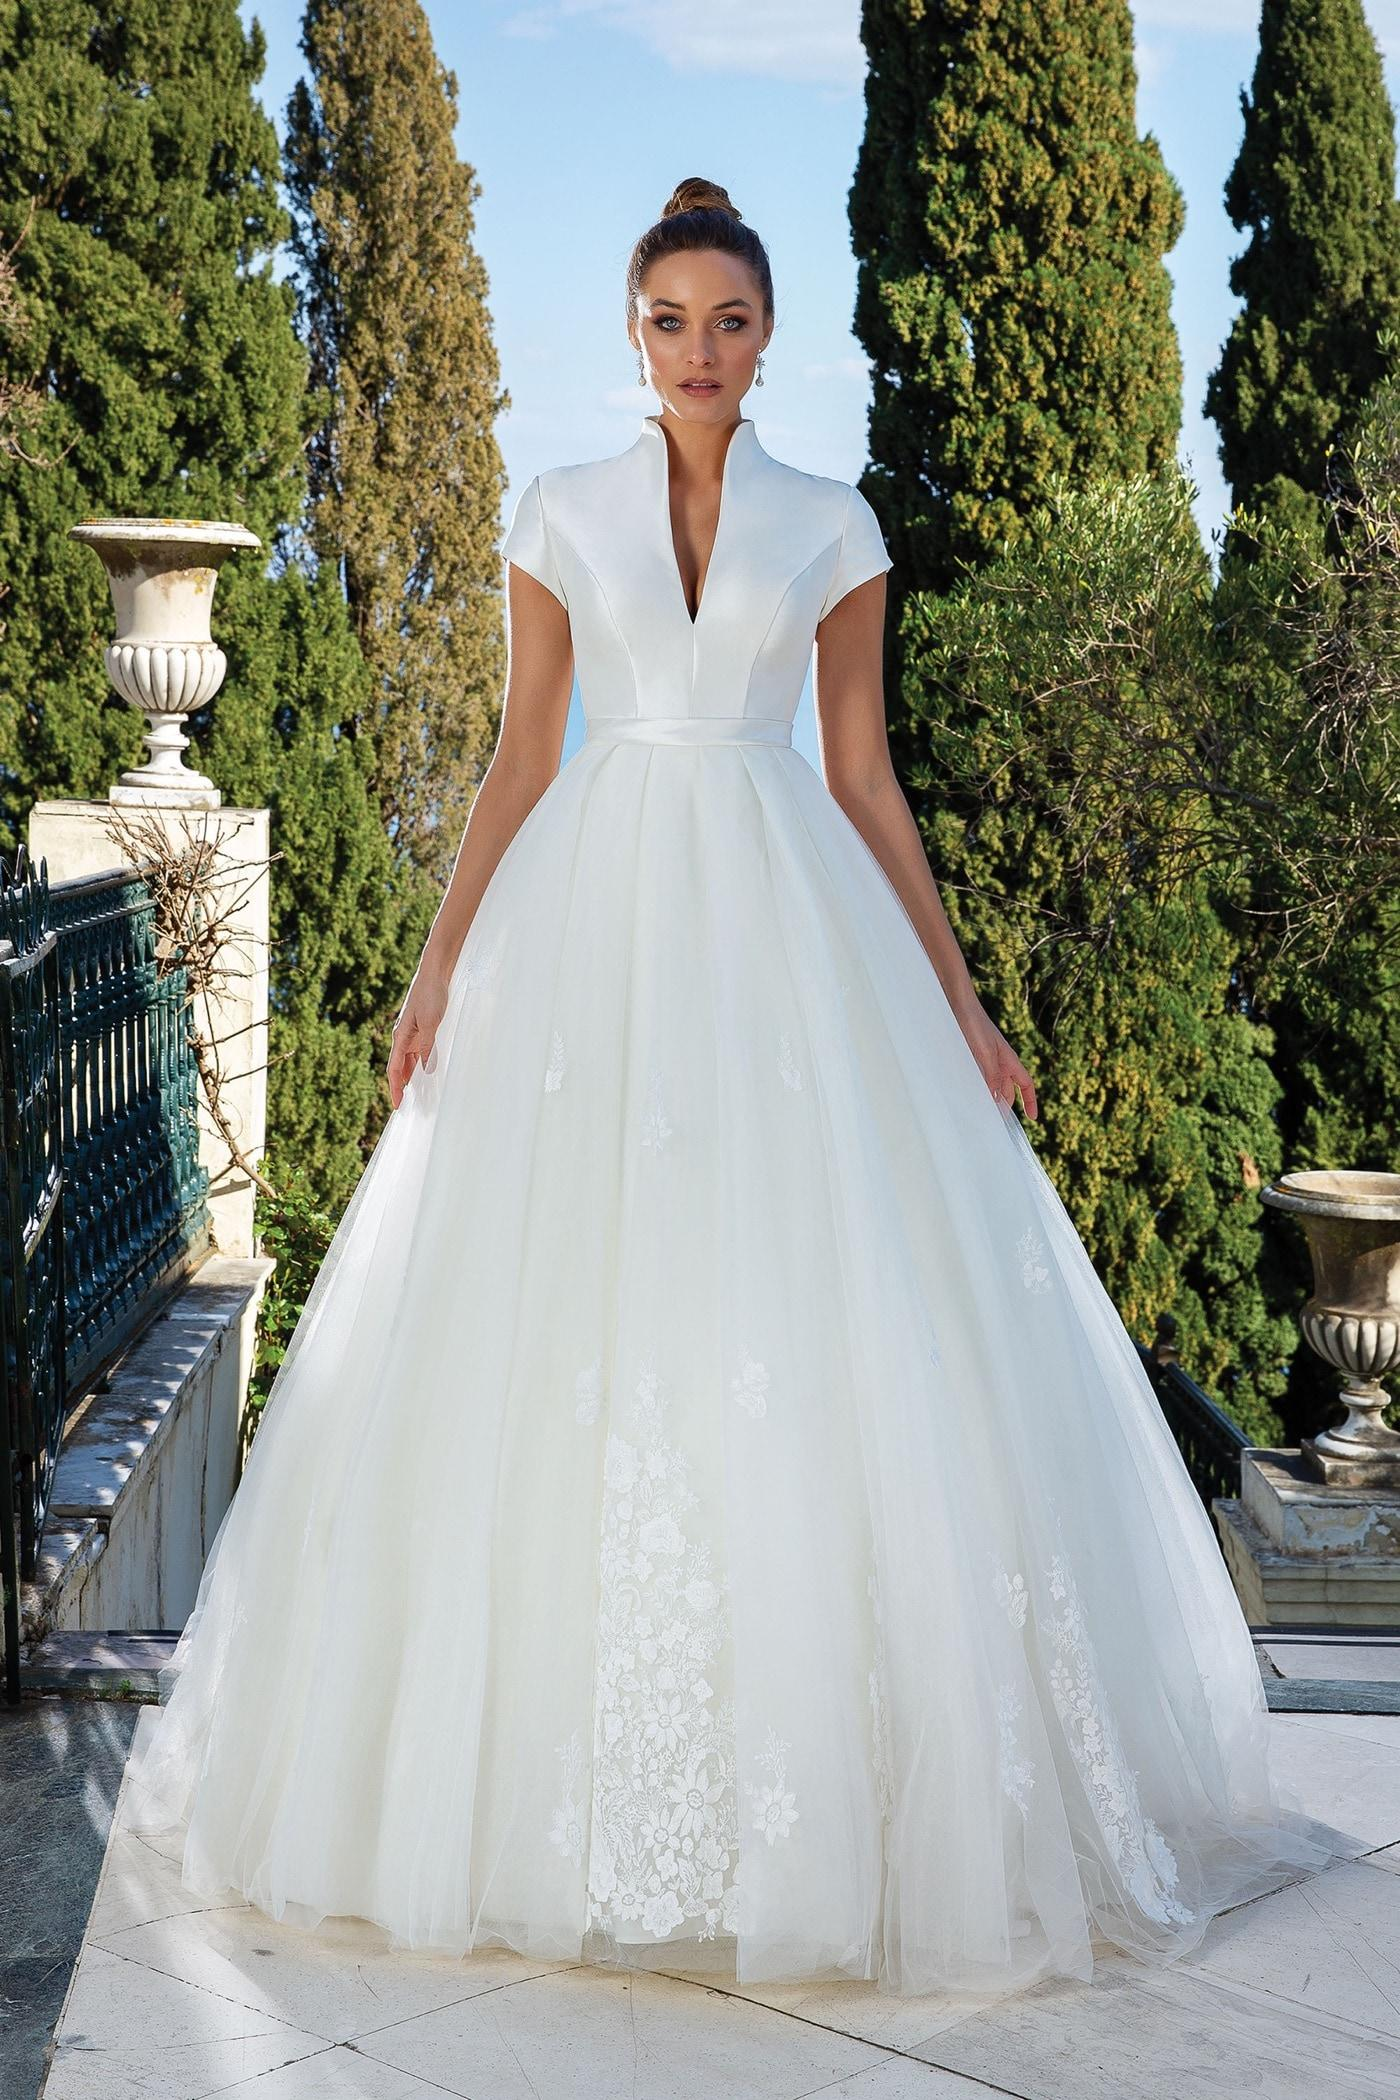 Wandelbares Fit-and-Flare-Brautkleid mit abnehmbarem Tüllrock